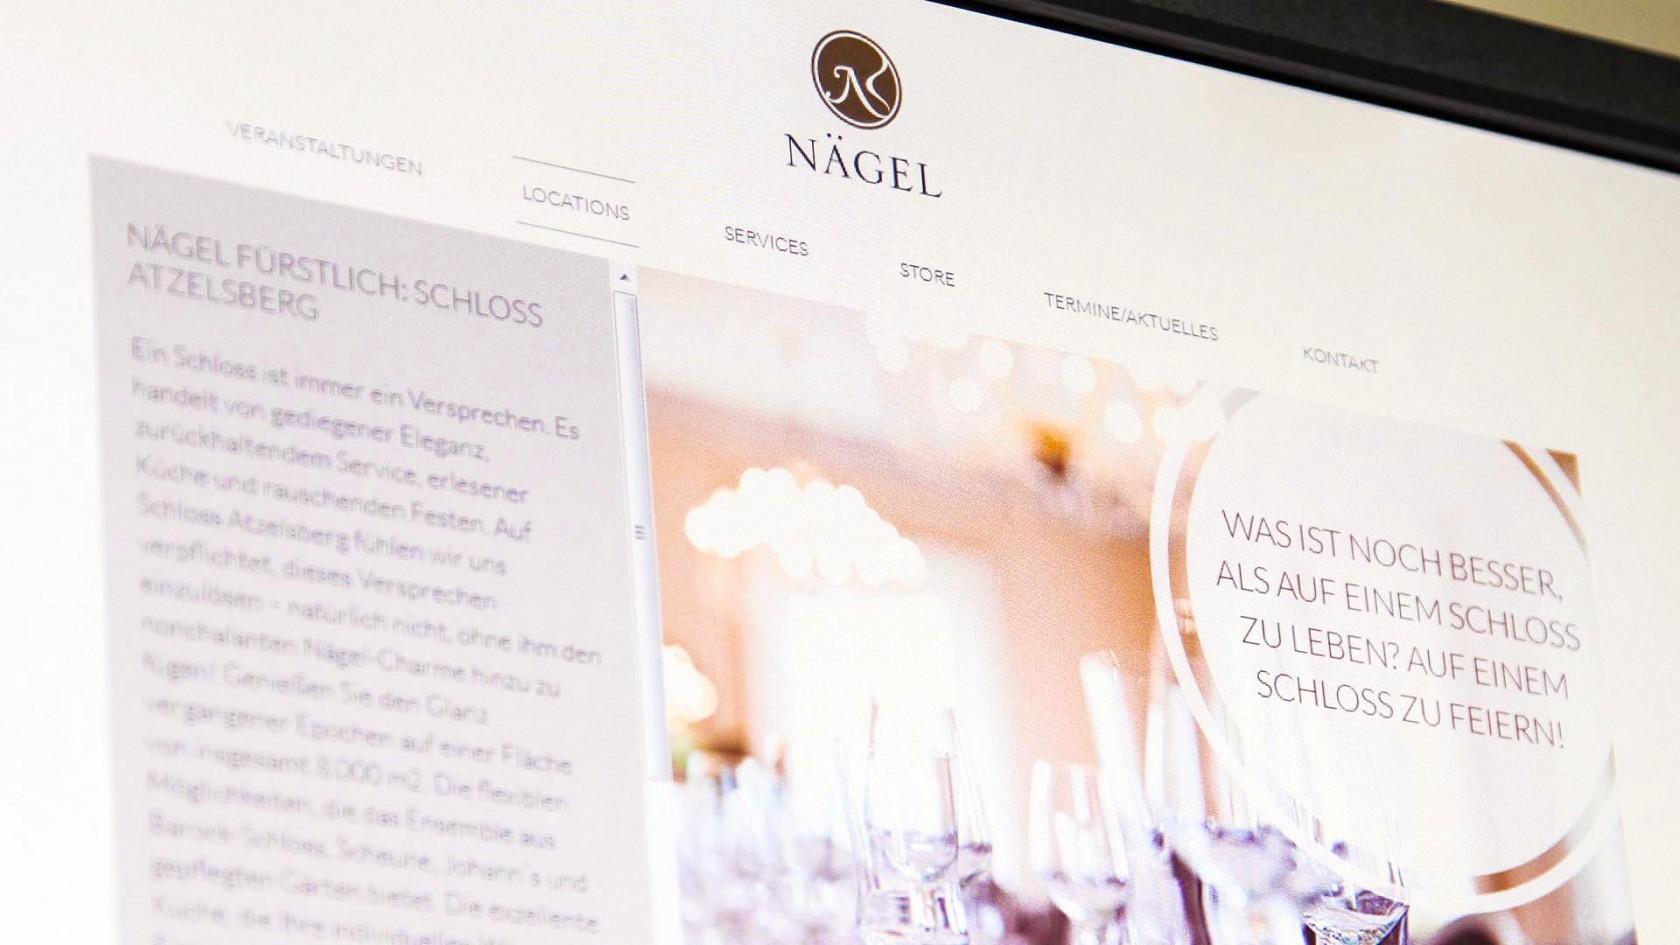 naegel-website_pic_0002